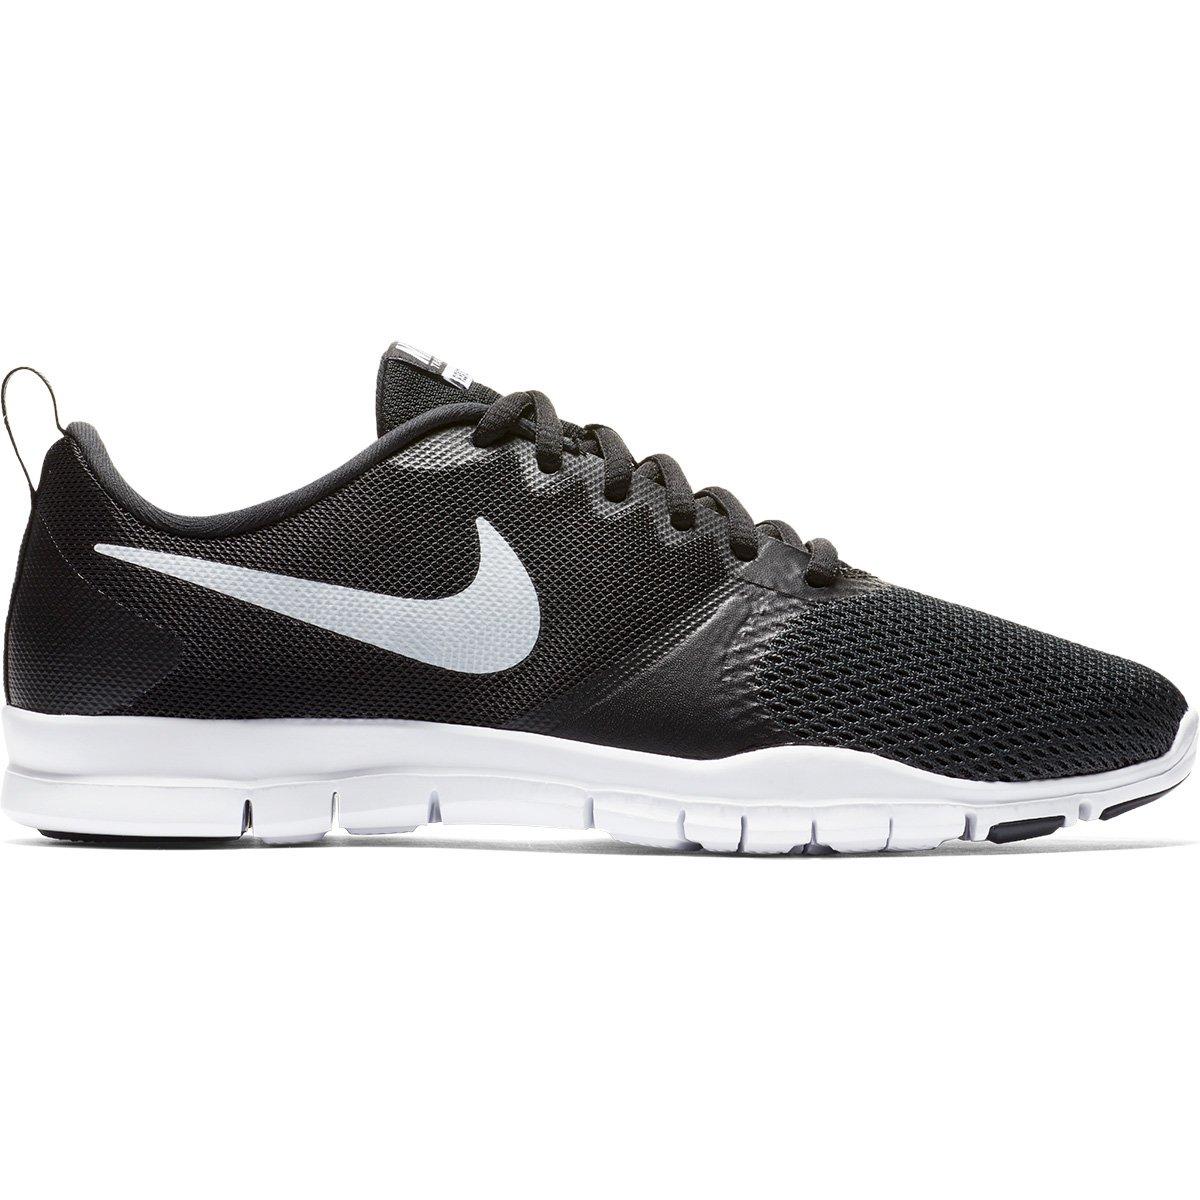 Tênis Nike Femininos - Melhores Preços  ecc99b38b24